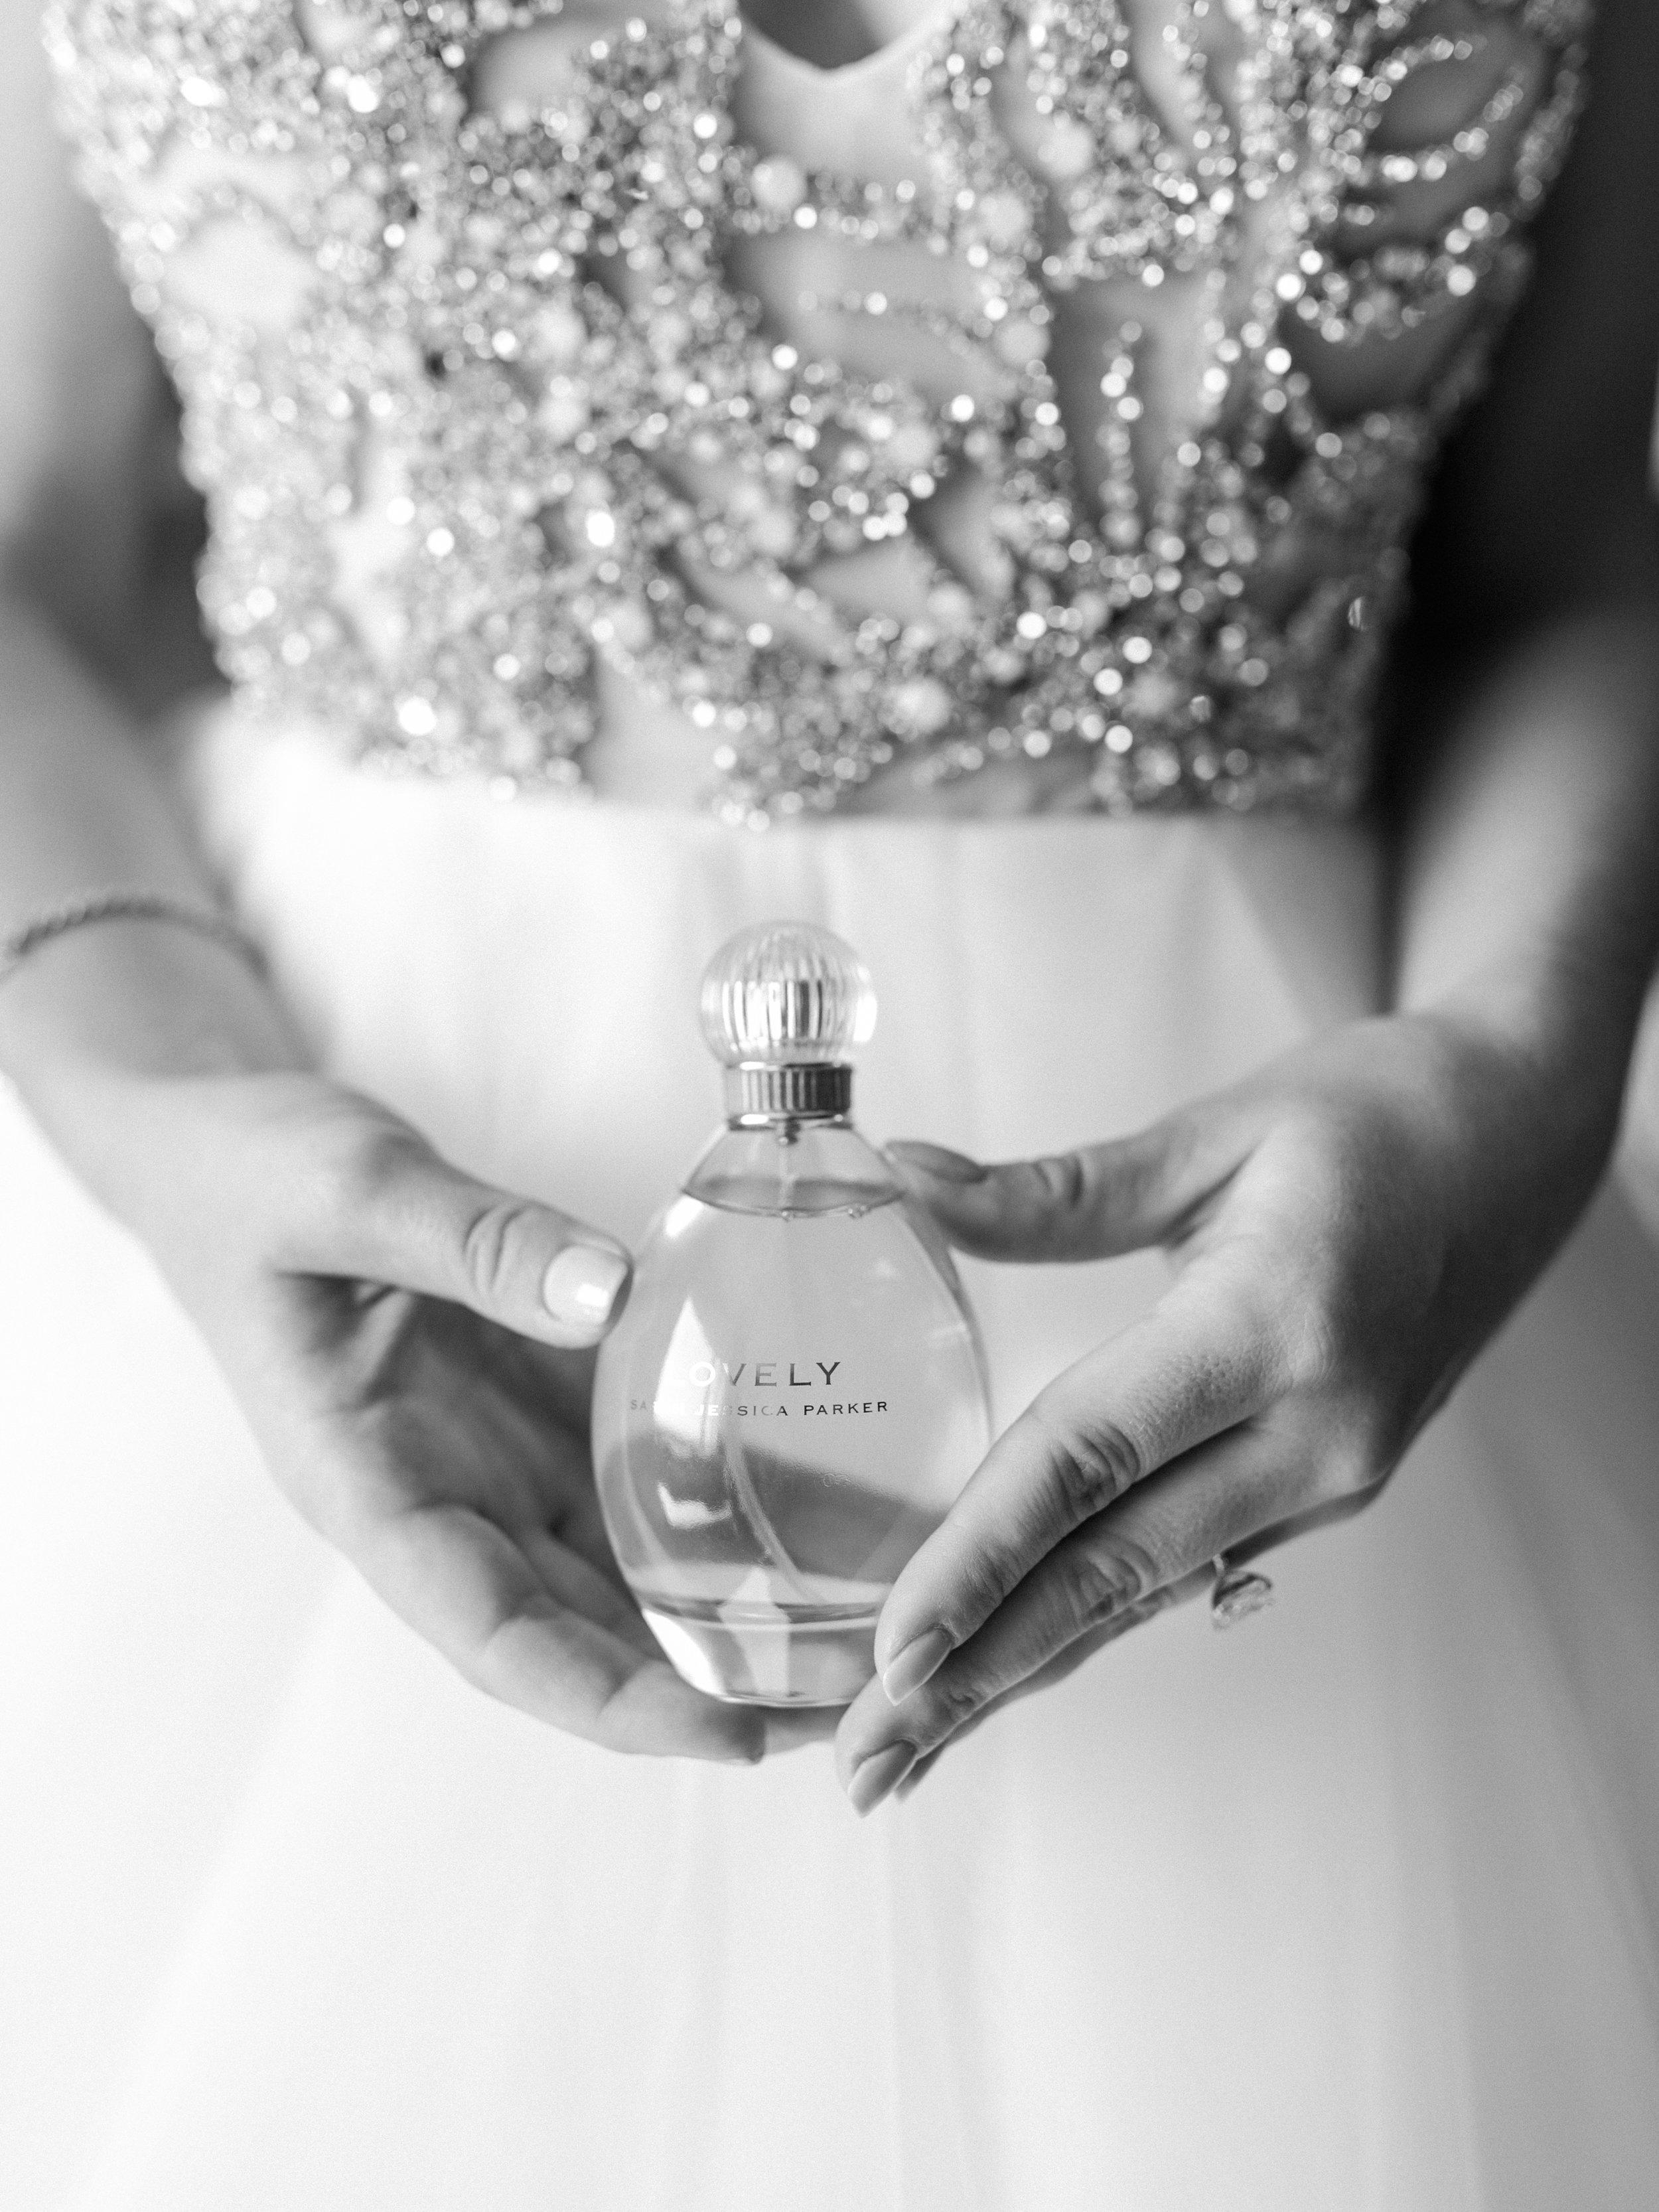 hyatt-regency-jersey-city-wedding-photographer13.jpg